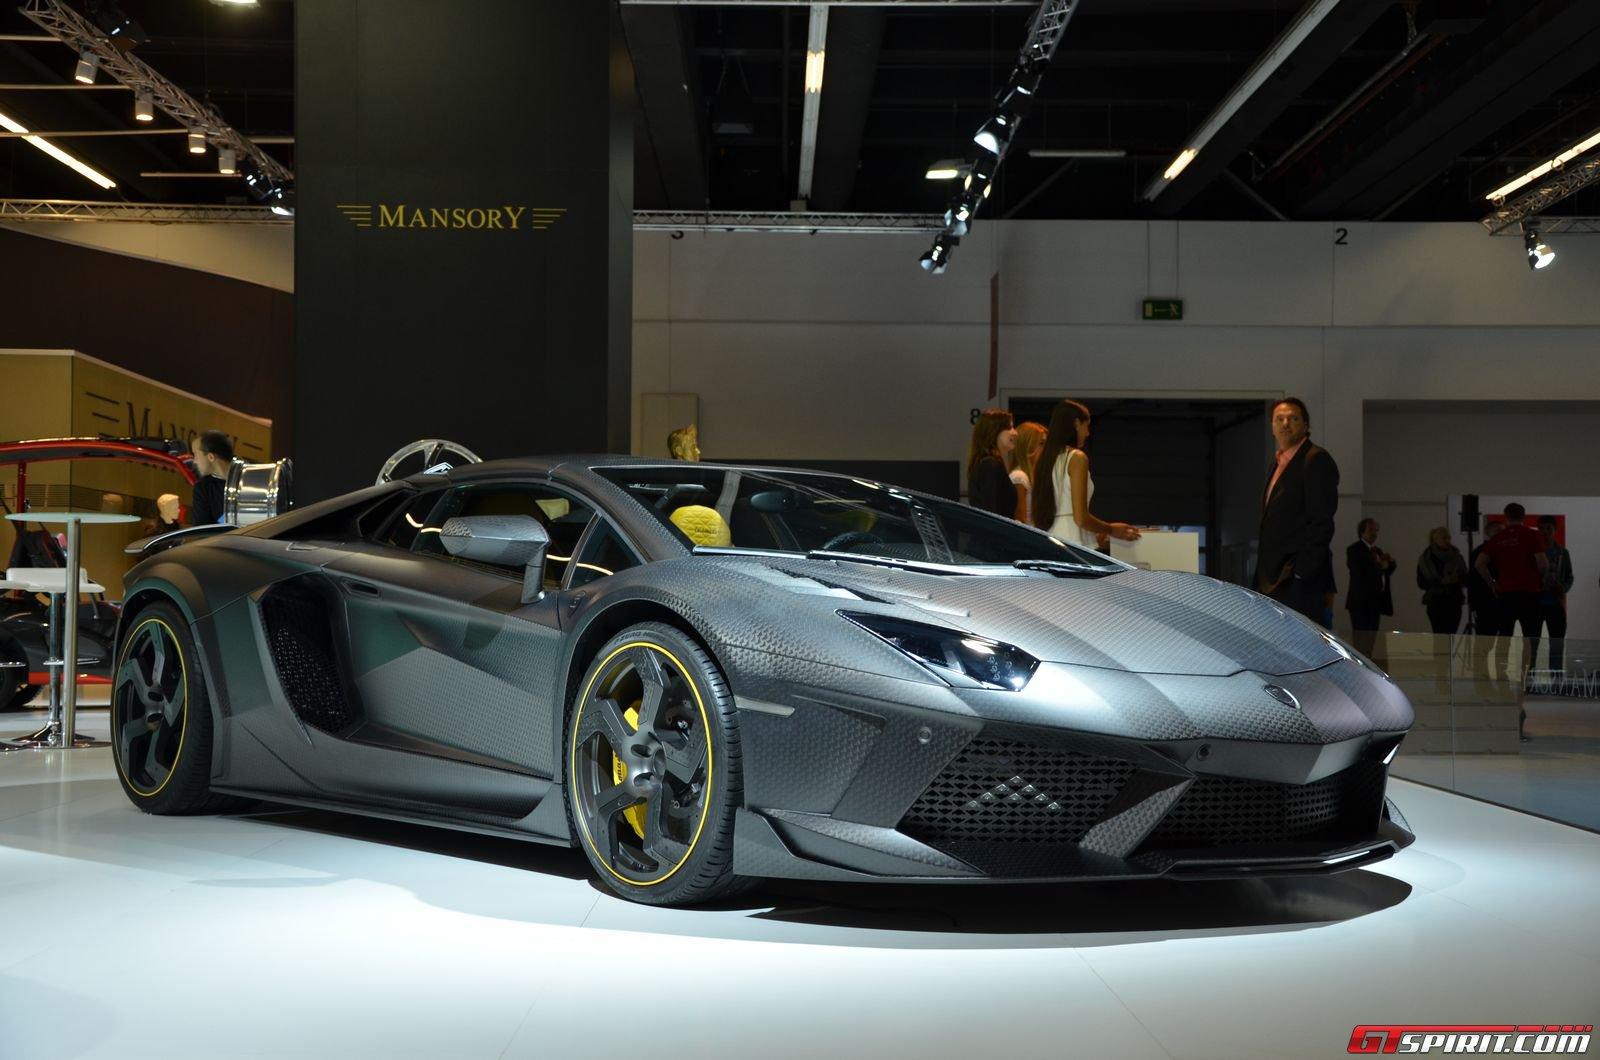 http://www.gtspirit.com/wp-content/uploads/2013/09/Mansory-Carbonado-Roadster.jpg